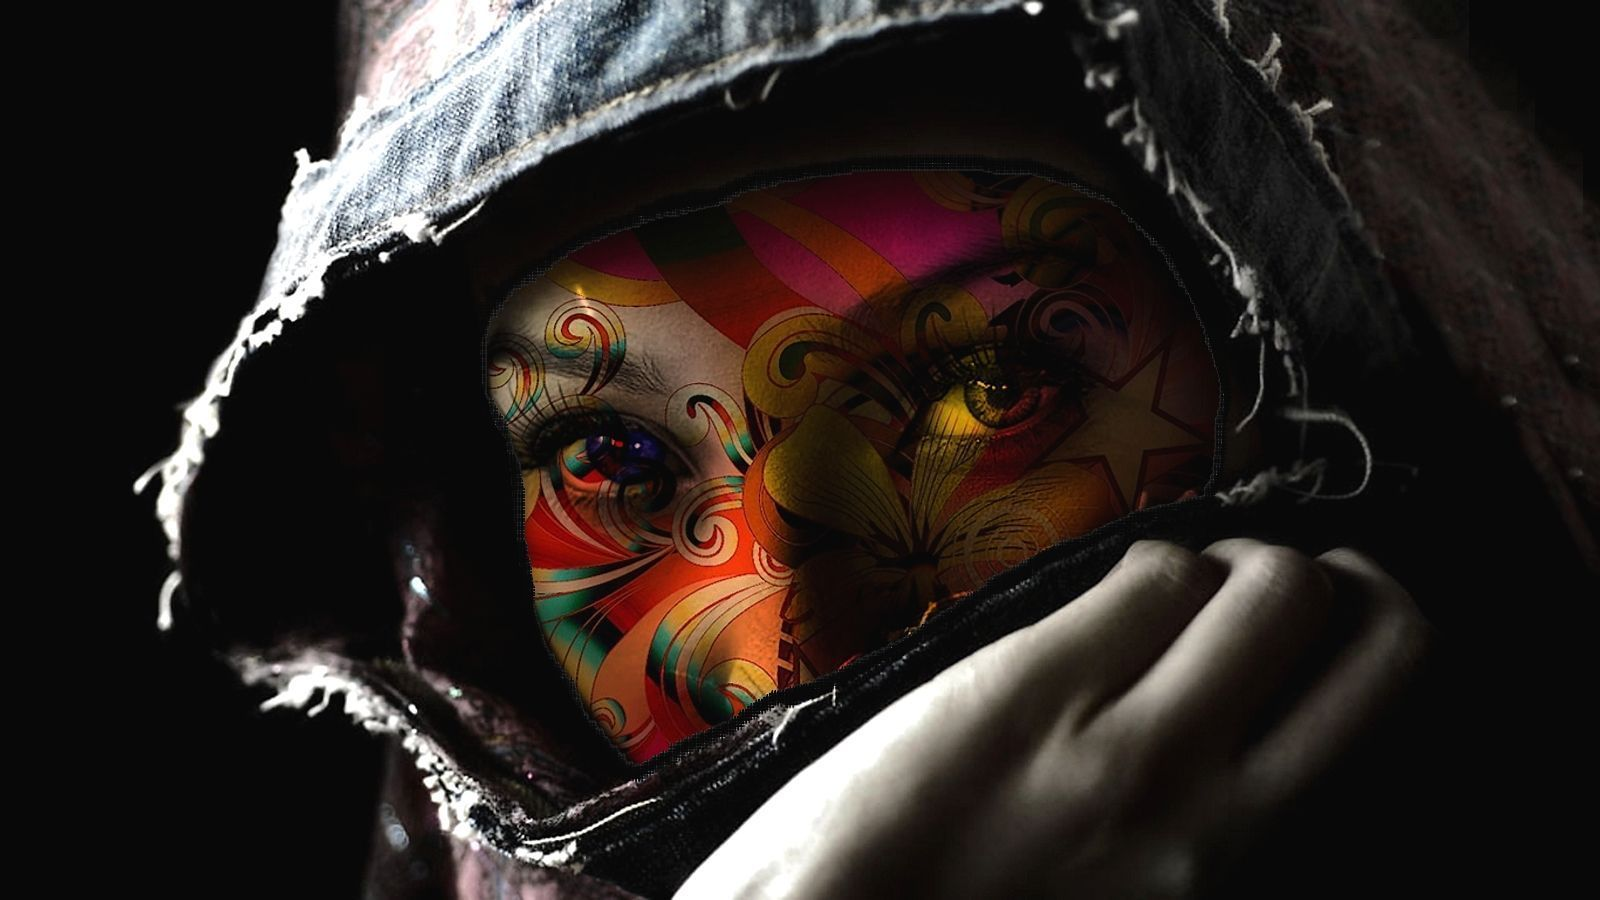 Download Tattoo Force Movie Wallpaper Art For Desktop